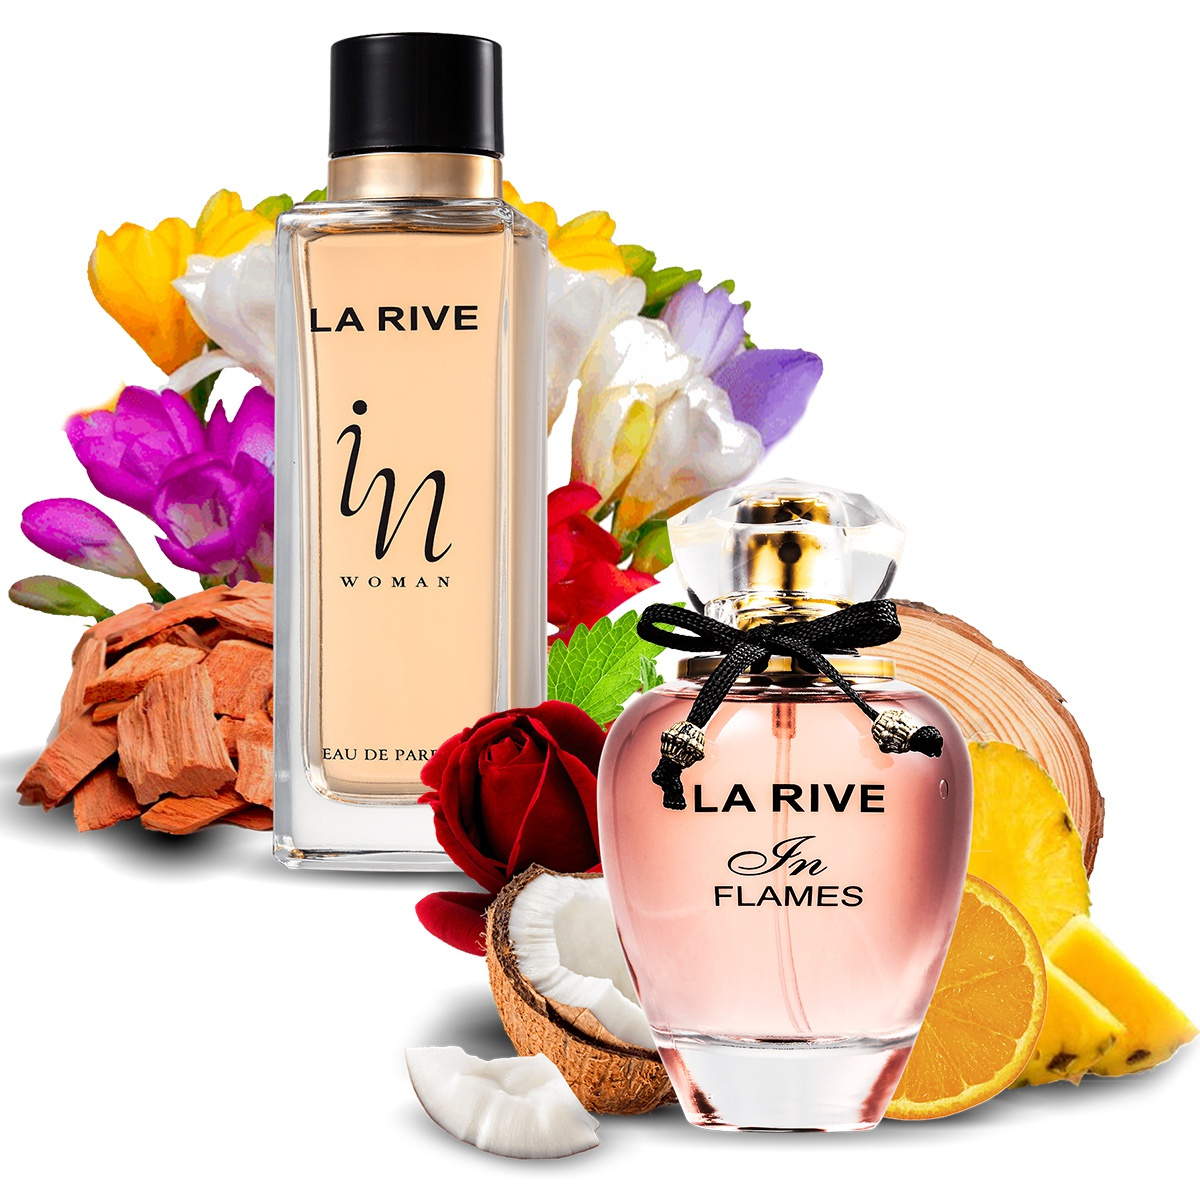 Kit 2 Perfumes Importados In Flames e In Woman La Rive  - Mercari Perfumes